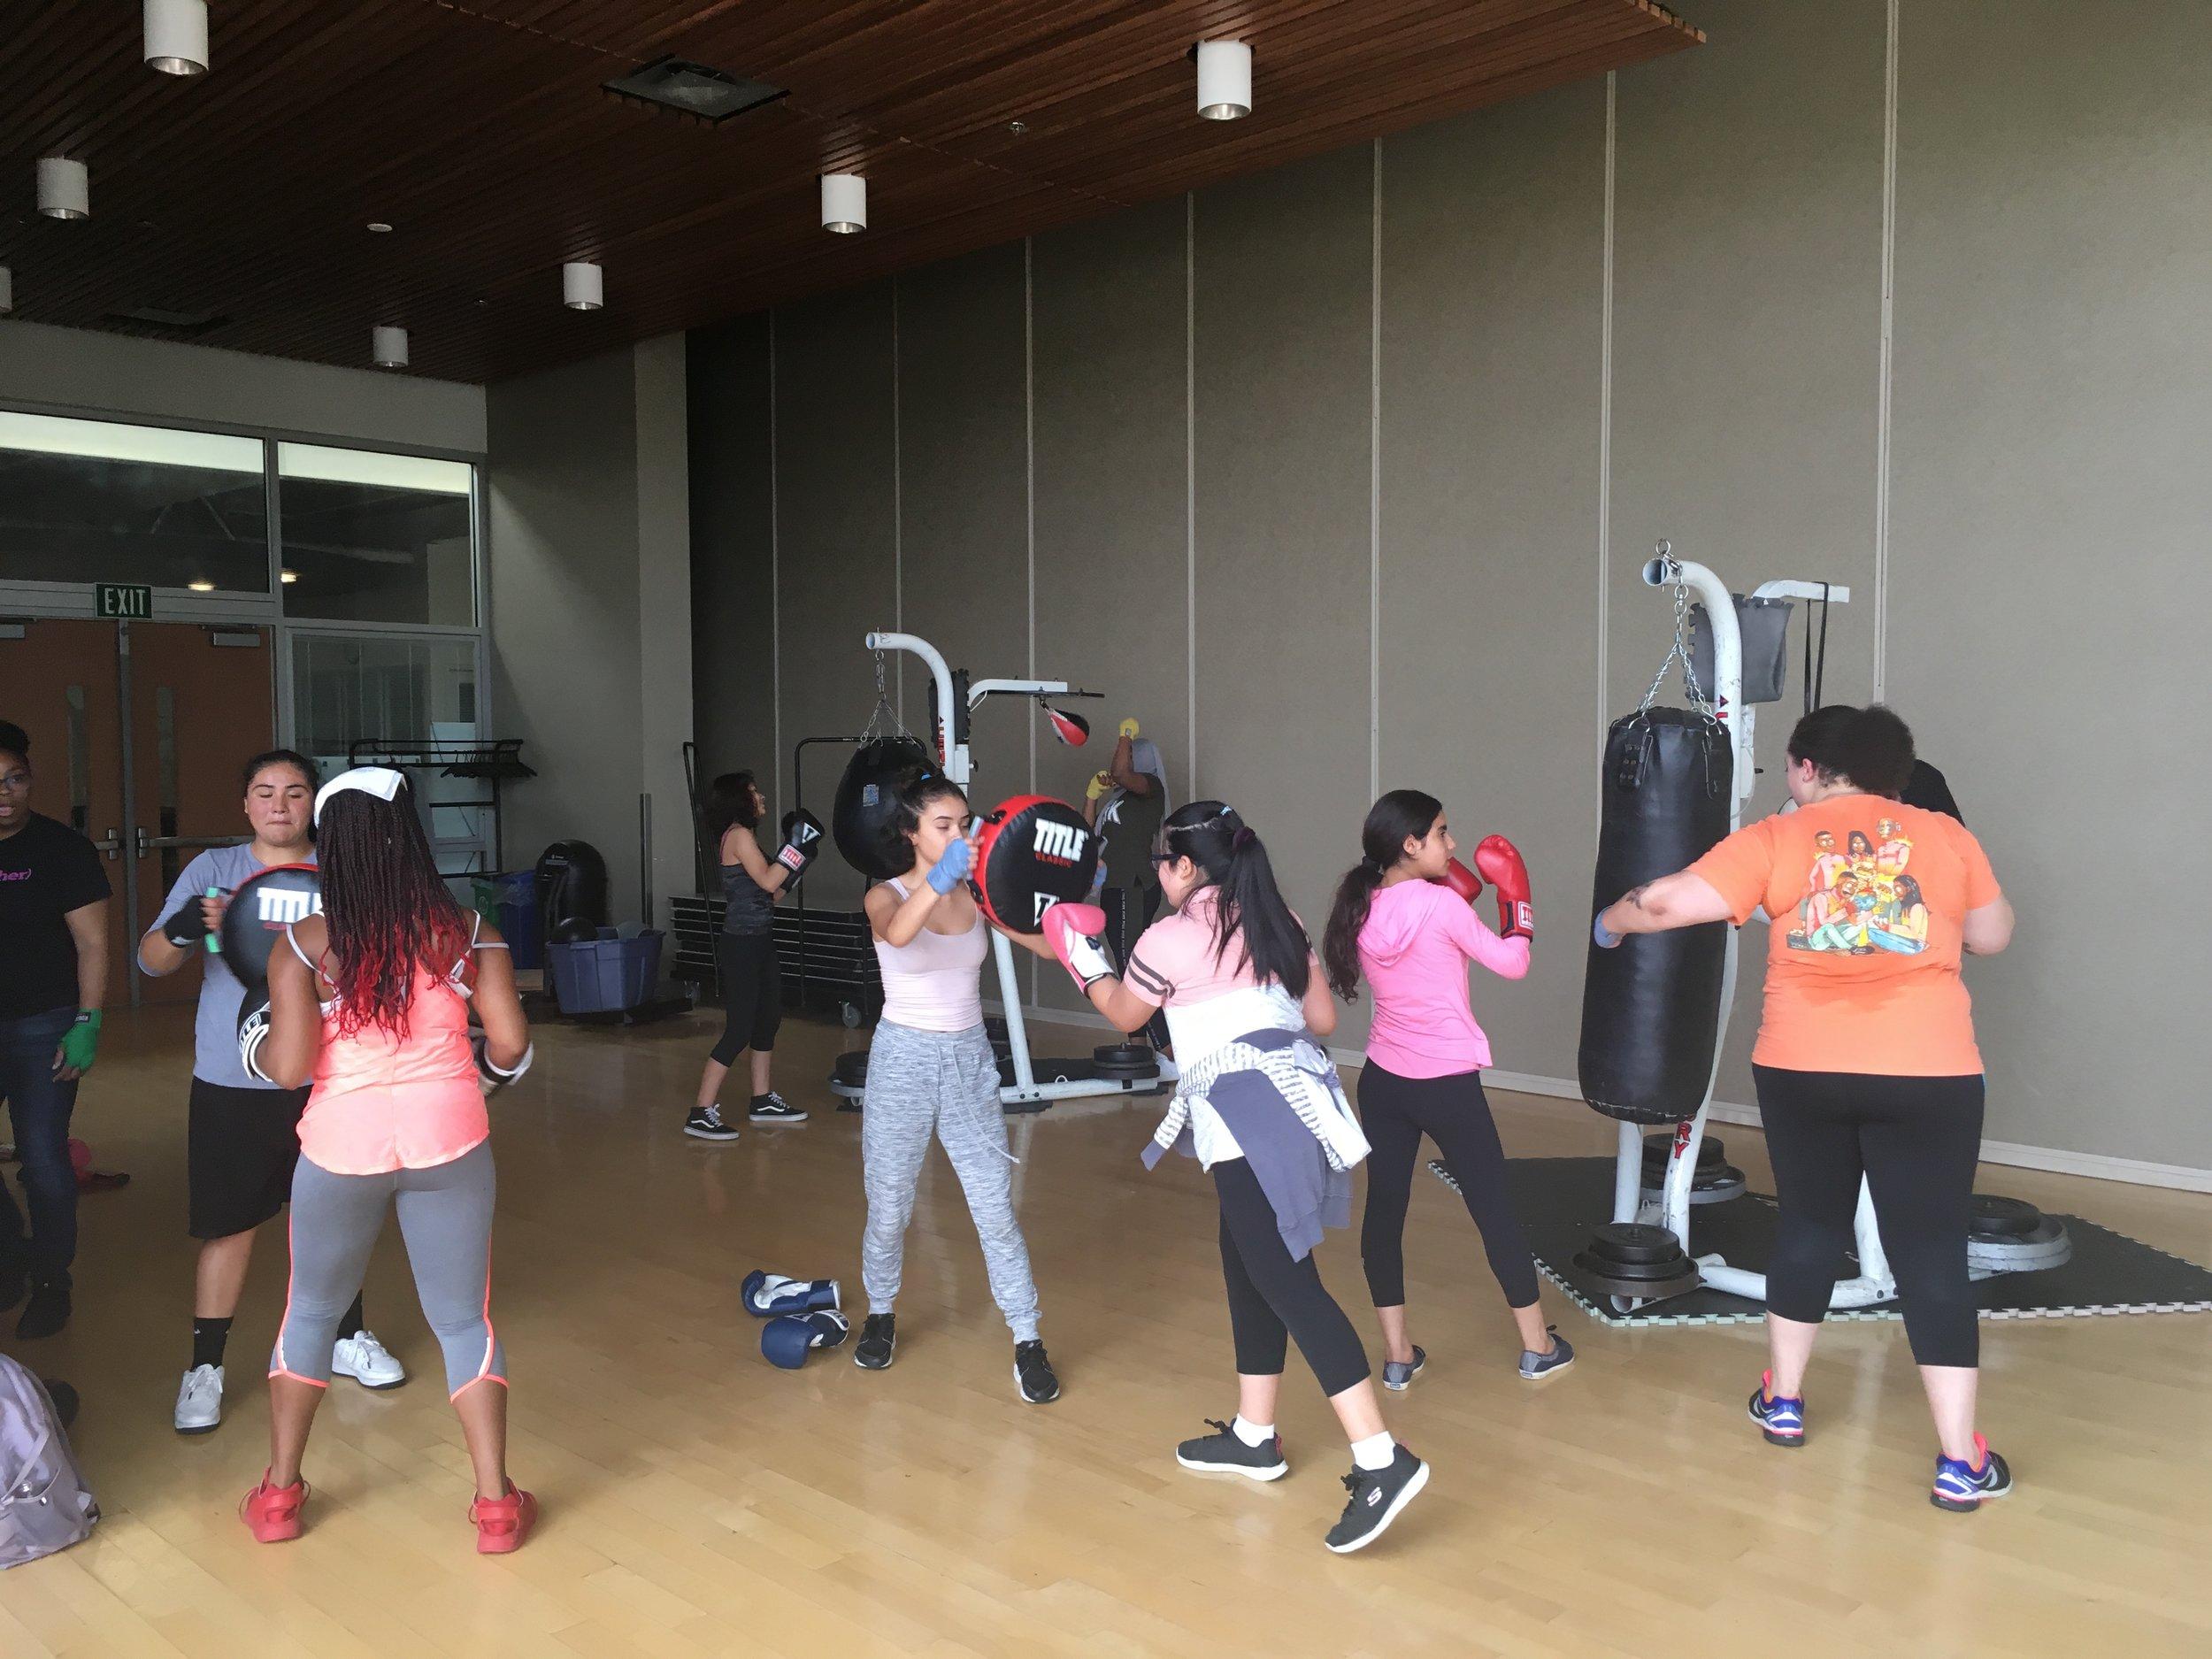 The 2019 Summer Punch cohort doing drills at Rainier Beach Community Center.